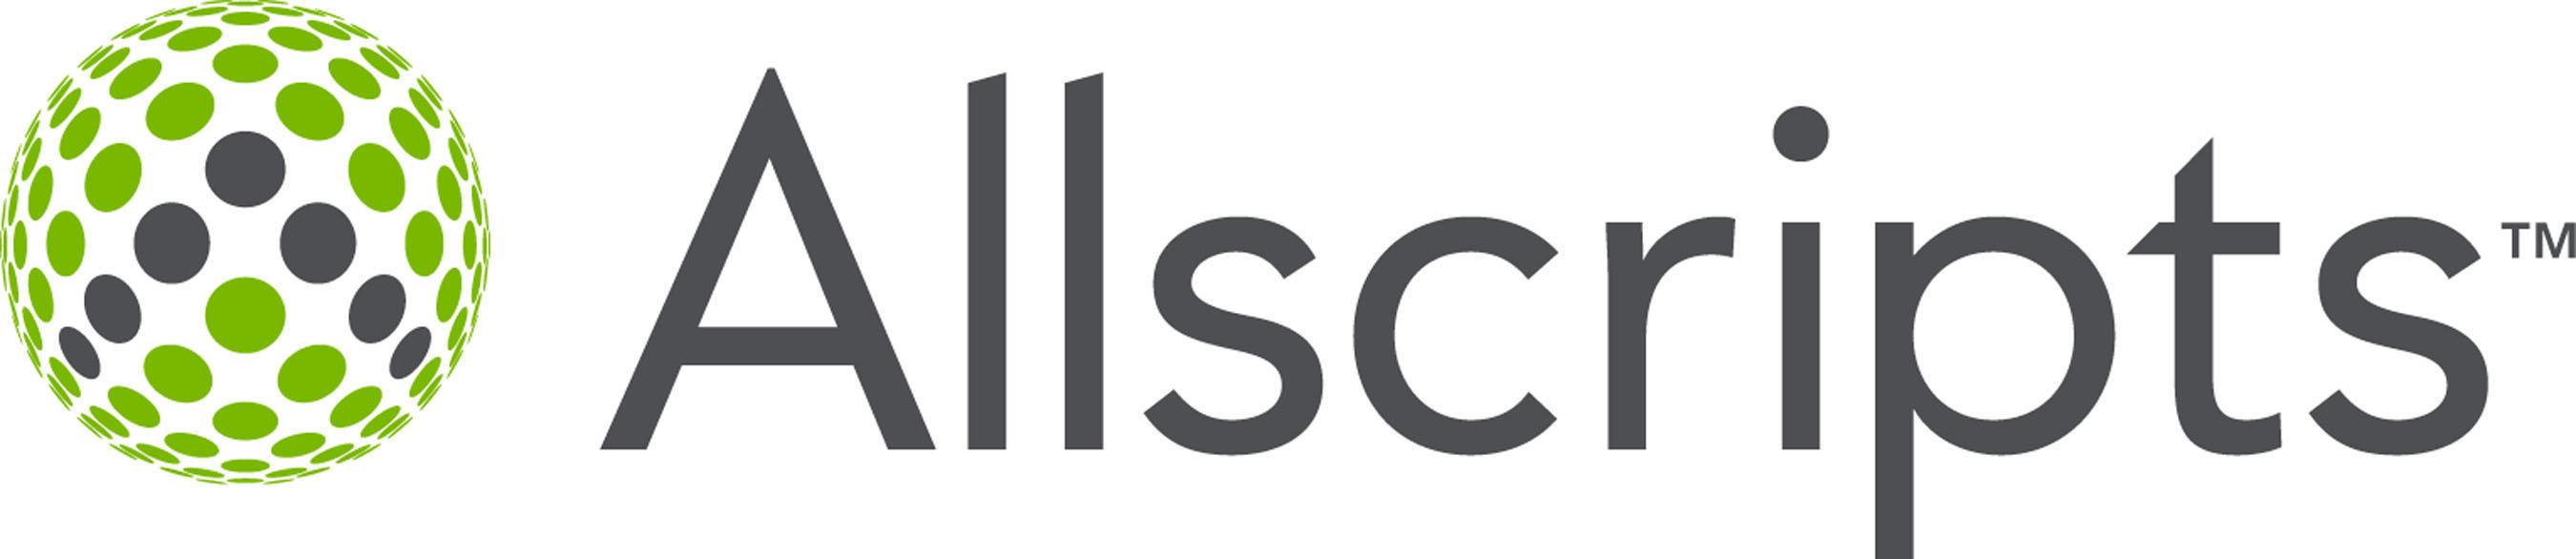 Allscripts Healthcare Solutions, Inc. Logo. (PRNewsFoto/Allscripts Healthcare Solutions, Inc.) (PRNewsFoto/)